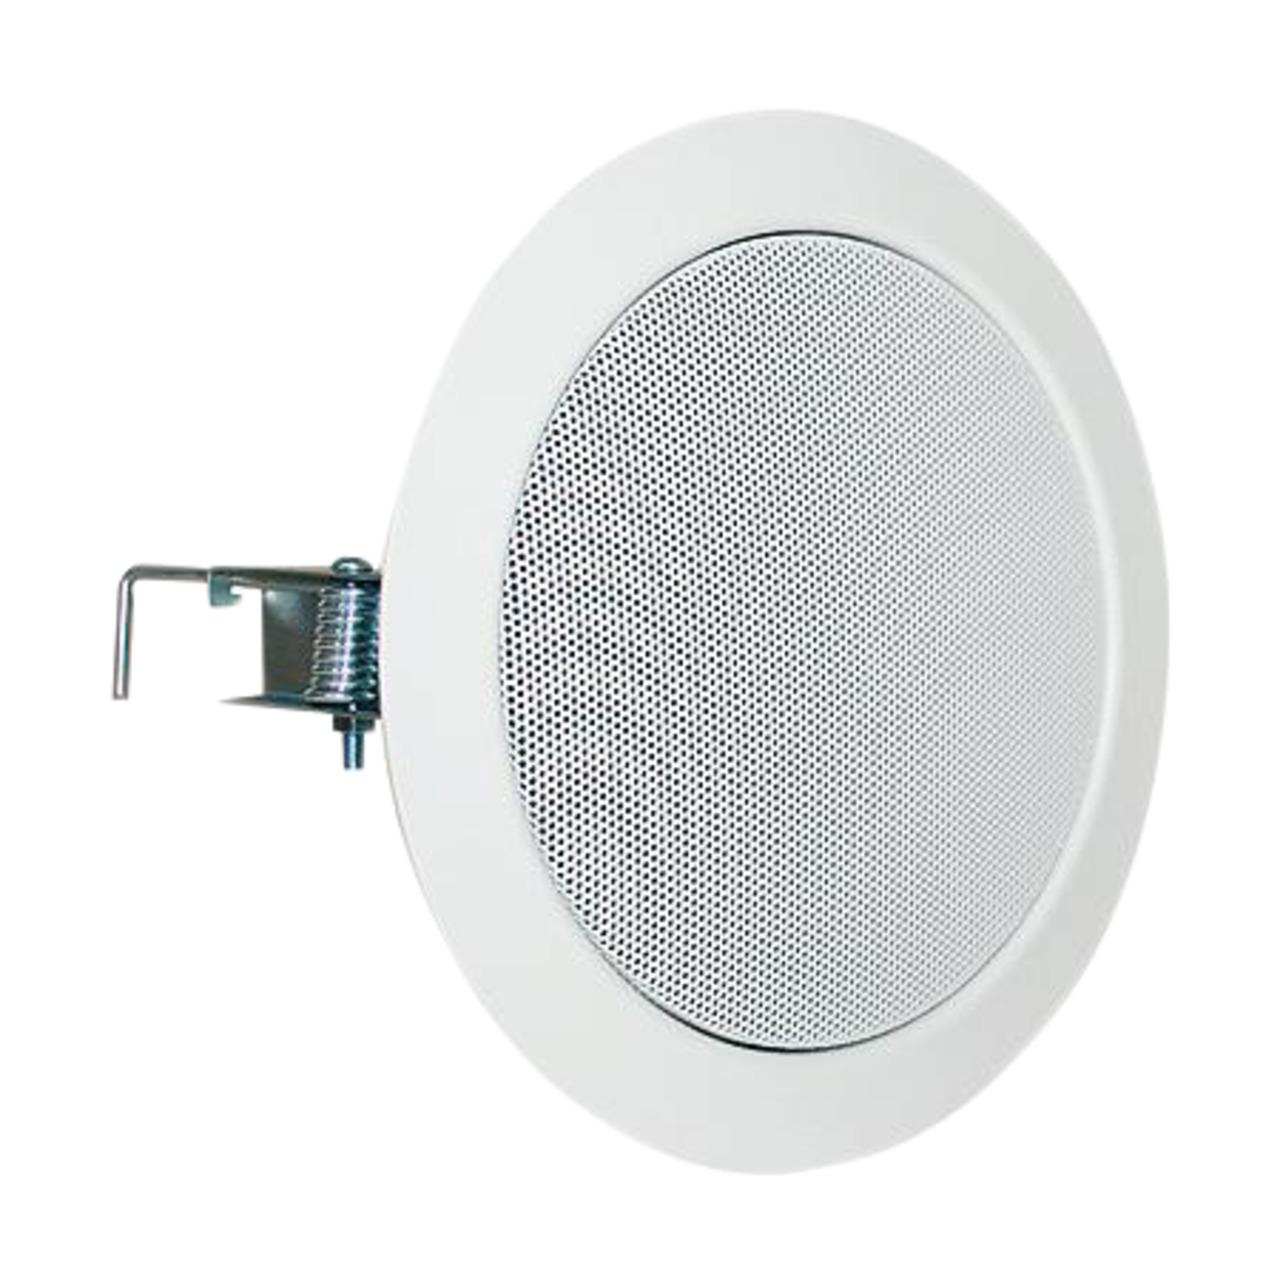 VISATON Hi-Fi-Deckenlautsprecher 13cm- DL 13-2 T- 8 Ohm